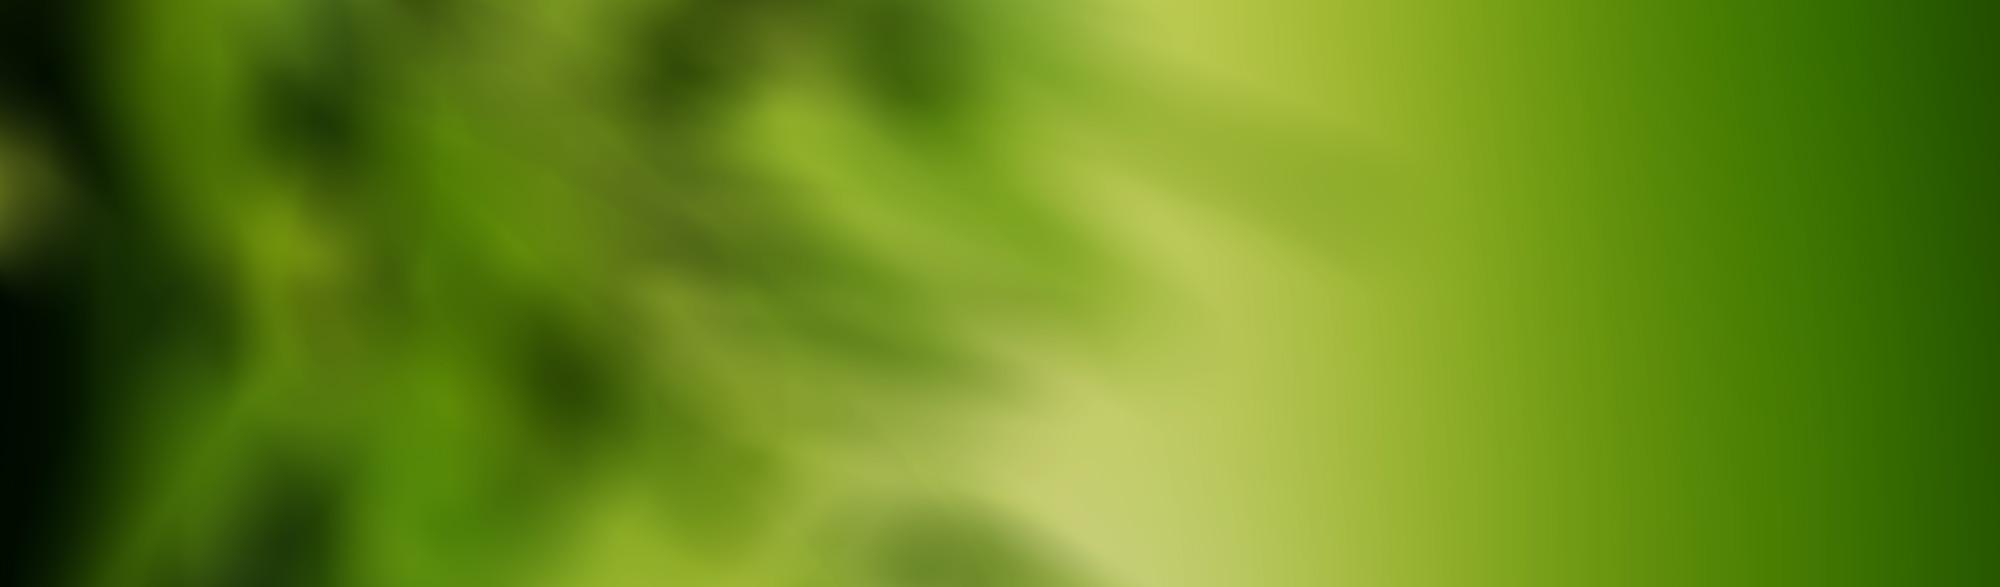 Ingin Menghilangkan Bulu Secara Permanen Inilah Cara Menghilangkan Bulu Secara Permanen Yang Bisa Dilakukan